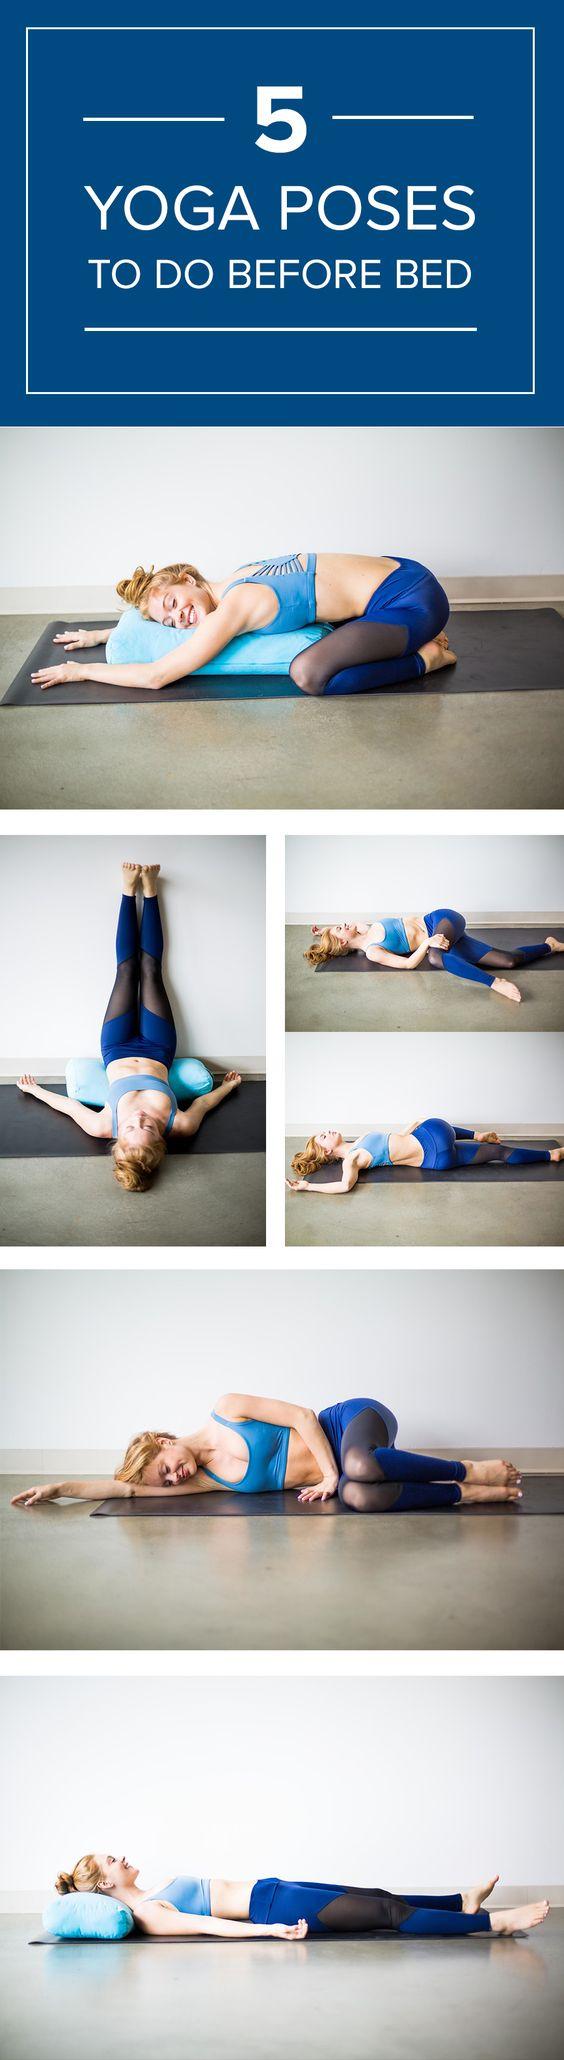 Bedtime yoga Poses to help you unwind